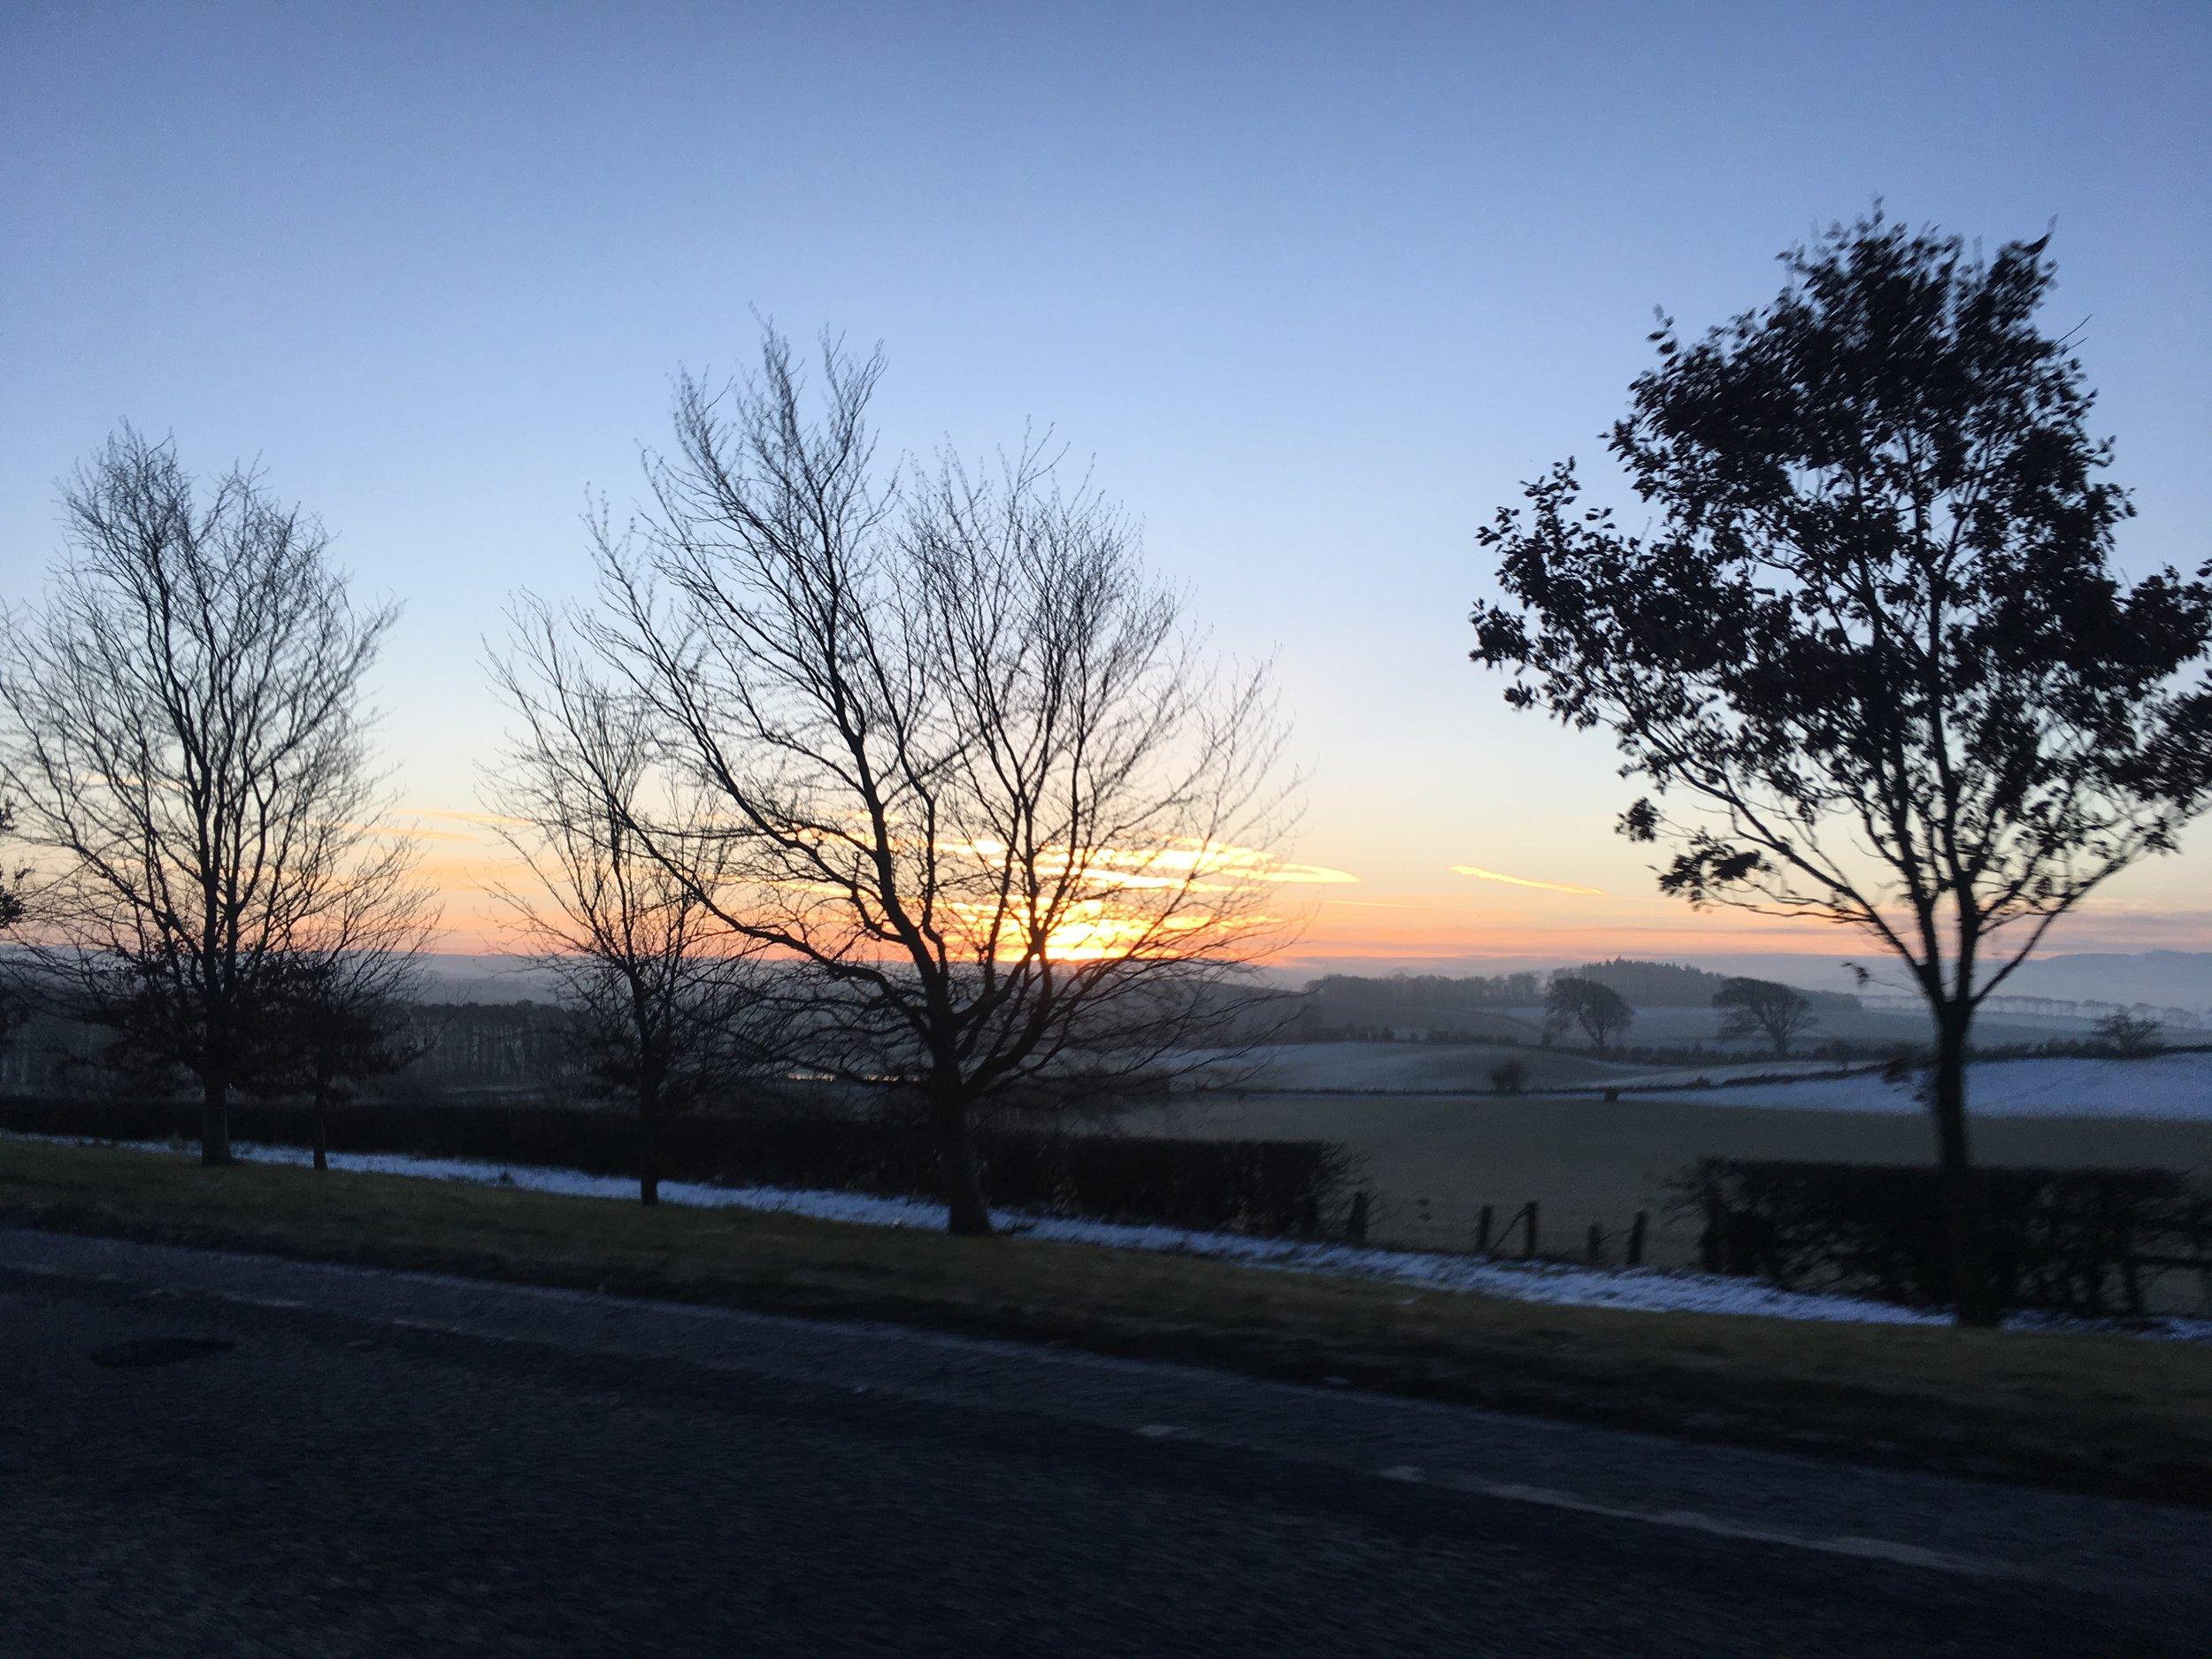 Scotland sunrise on the train ride to Edinburg.